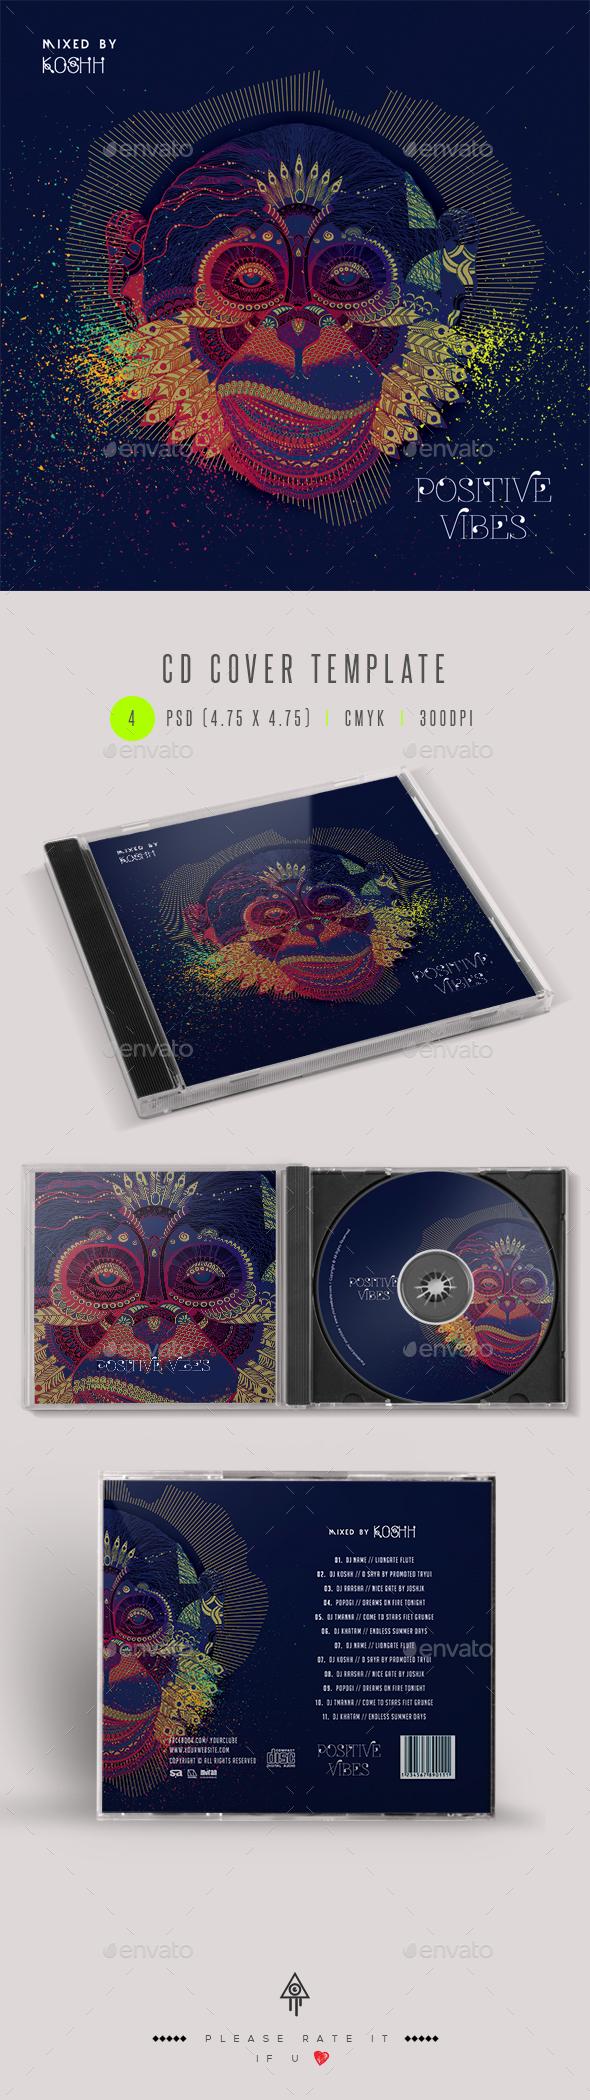 Positive Vibes - CD Cover Artwork - CD & DVD Artwork Print Templates